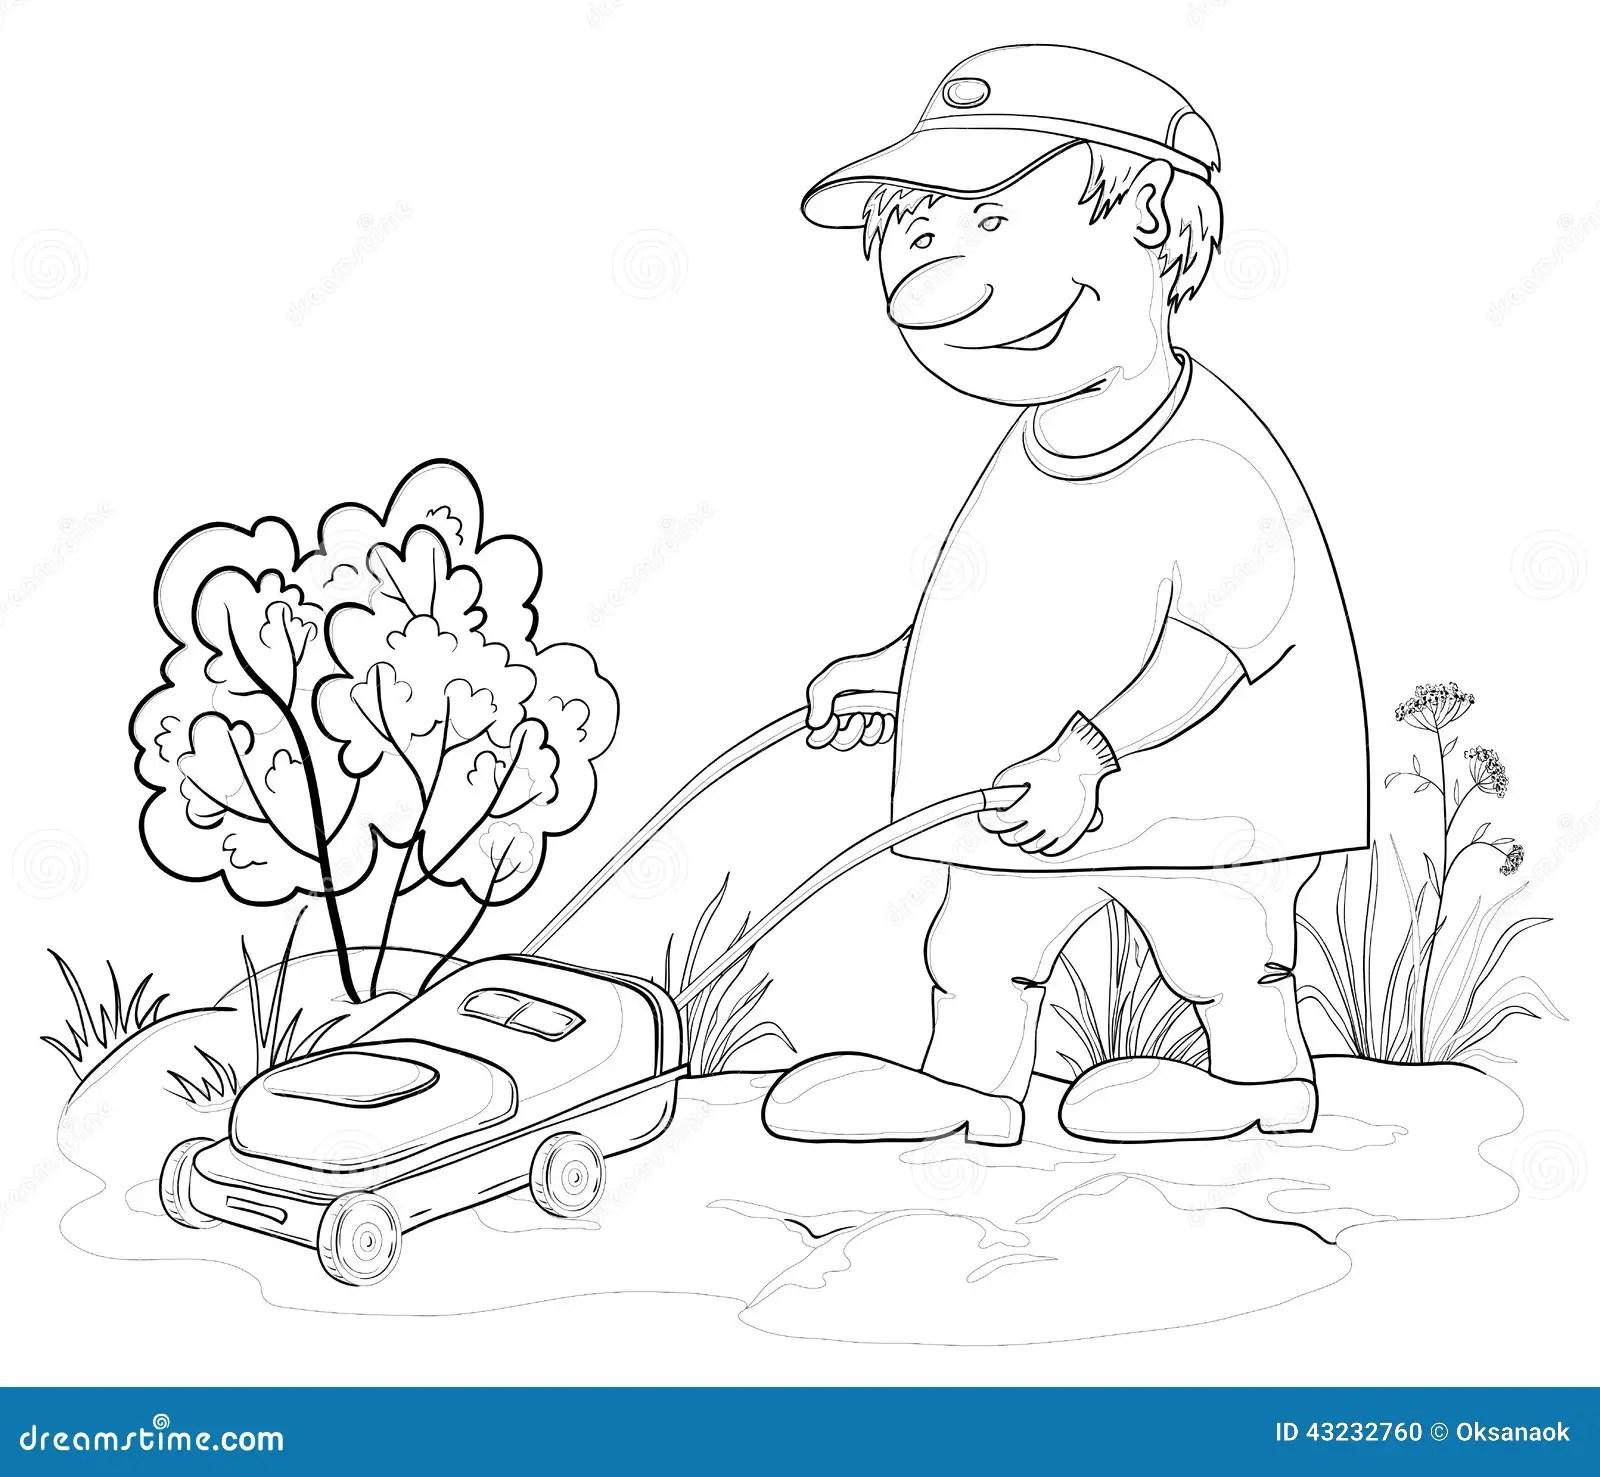 Lawn Mower Man Outline Stock Vector Illustration Of